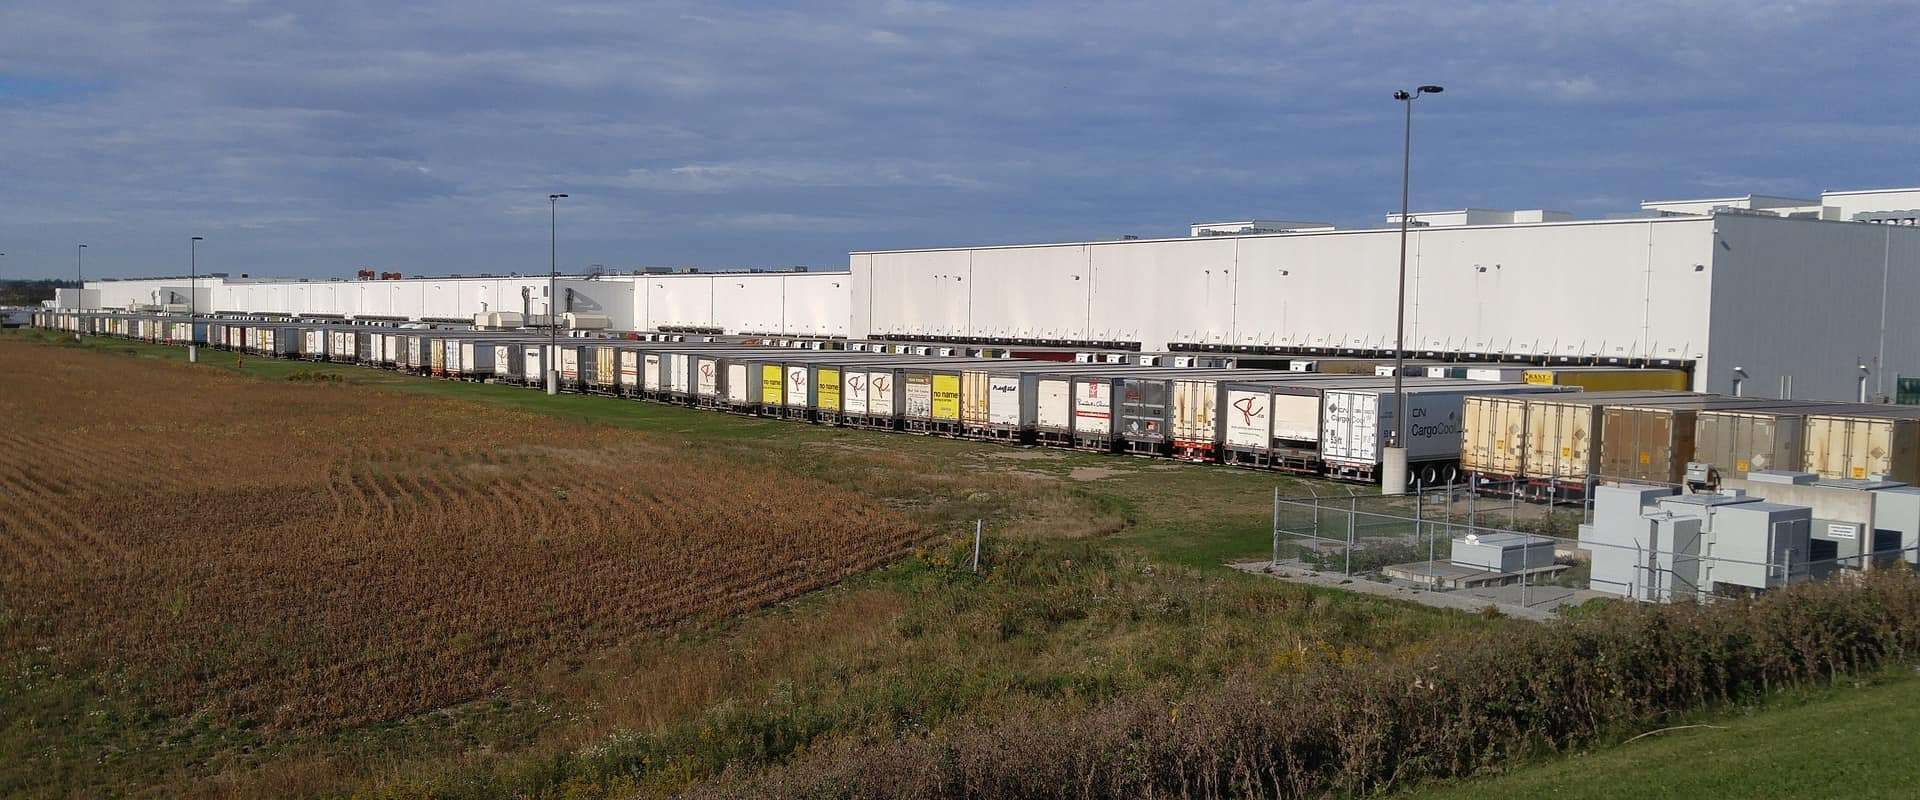 NVE Belieferungen mit COSYS Transport Logistik tracken